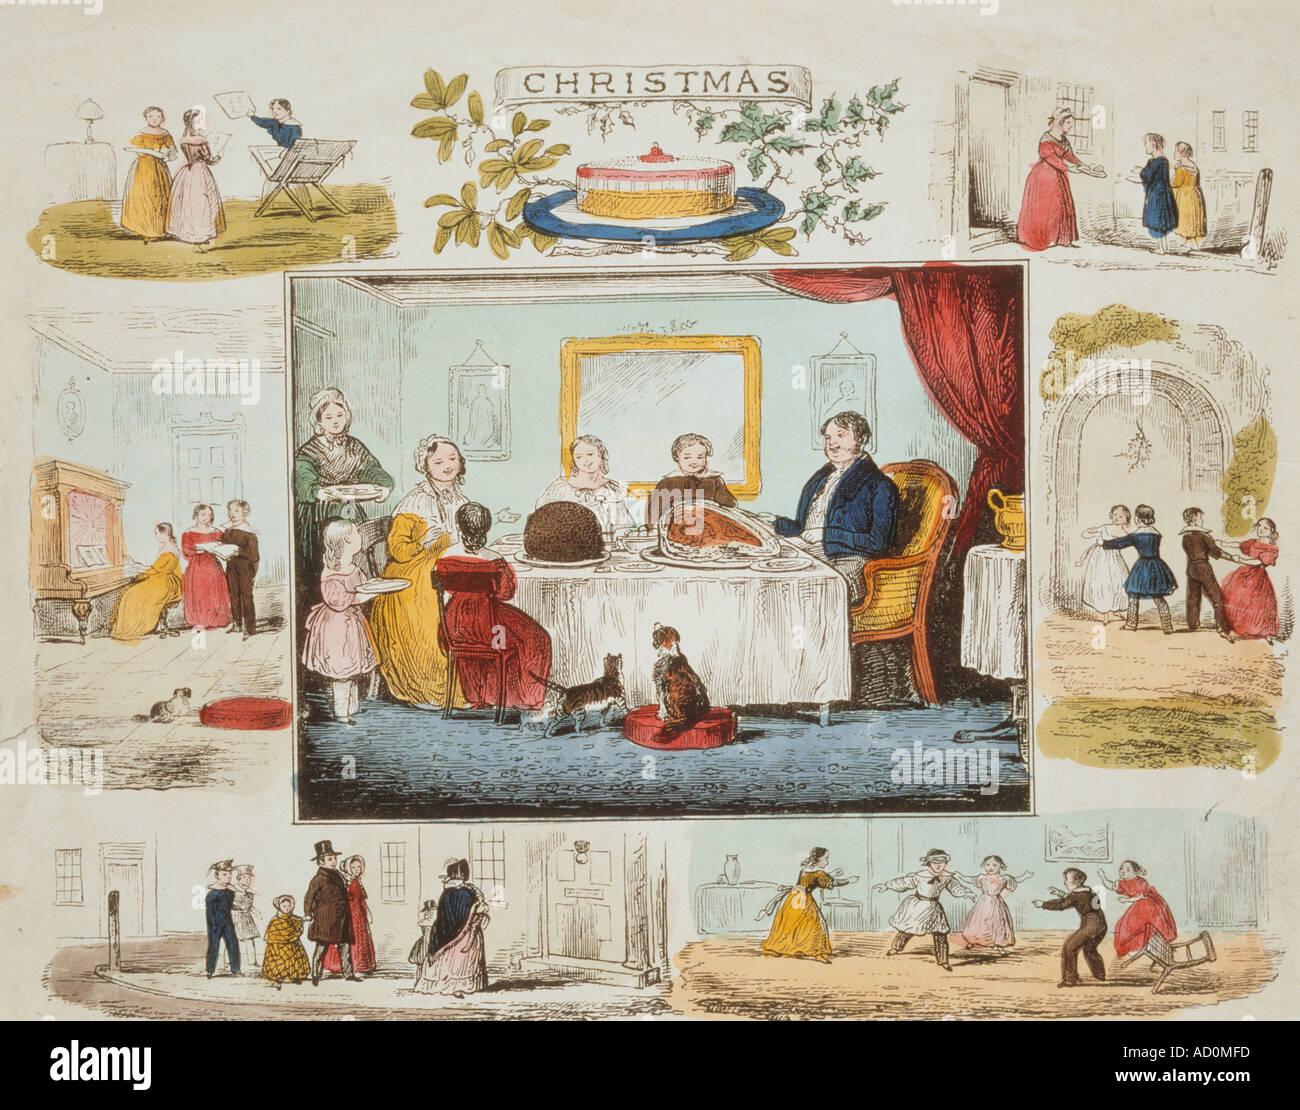 Sábana. Inglaterra, siglo XIX. Imagen De Stock